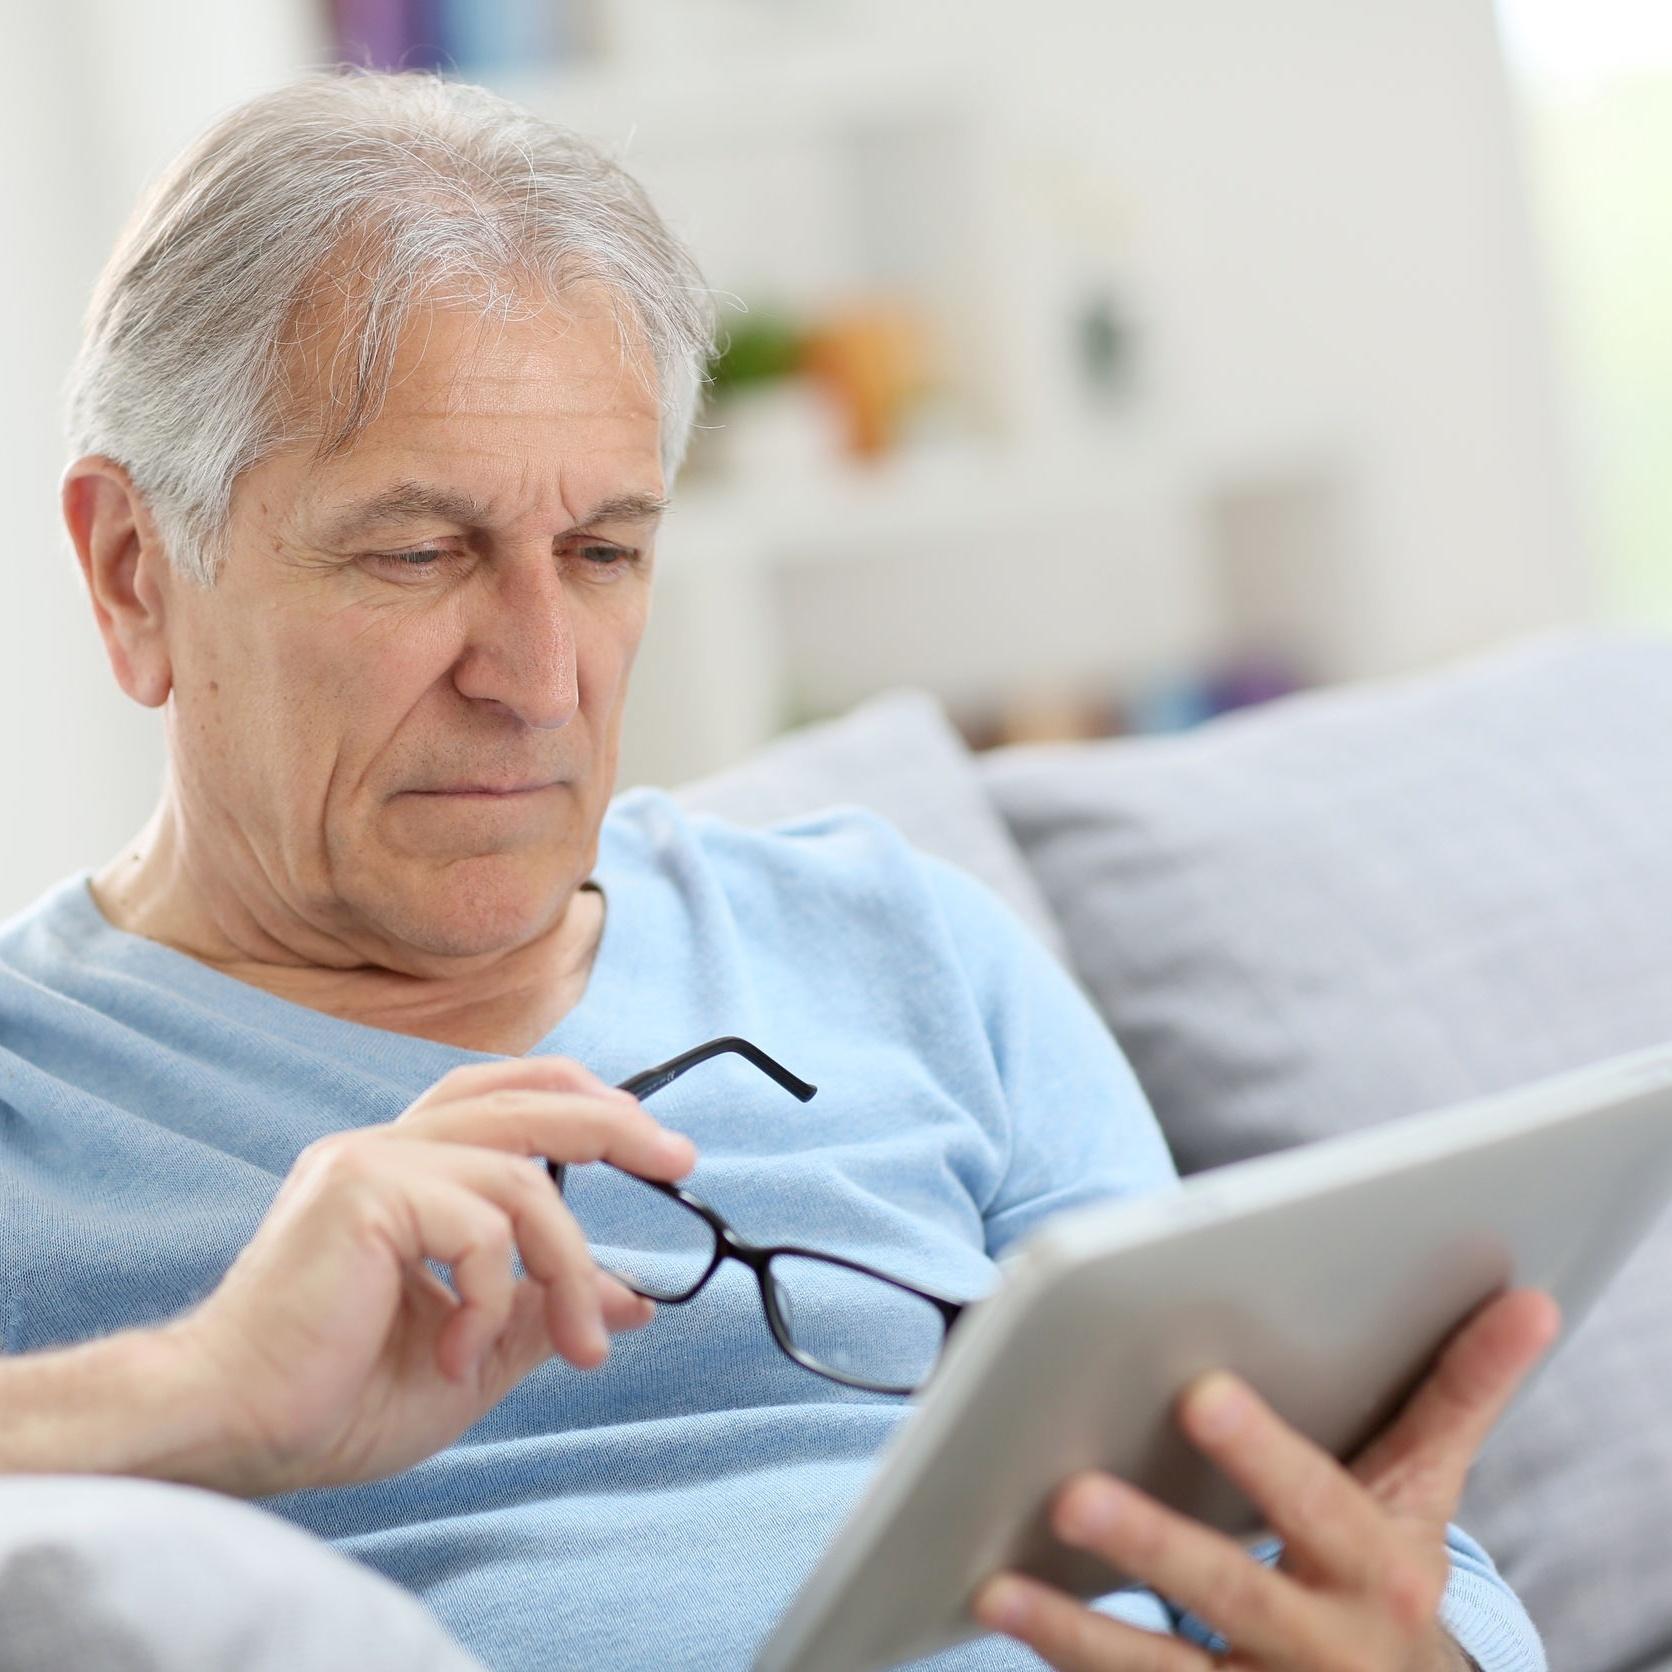 patient looks online-110053-edited